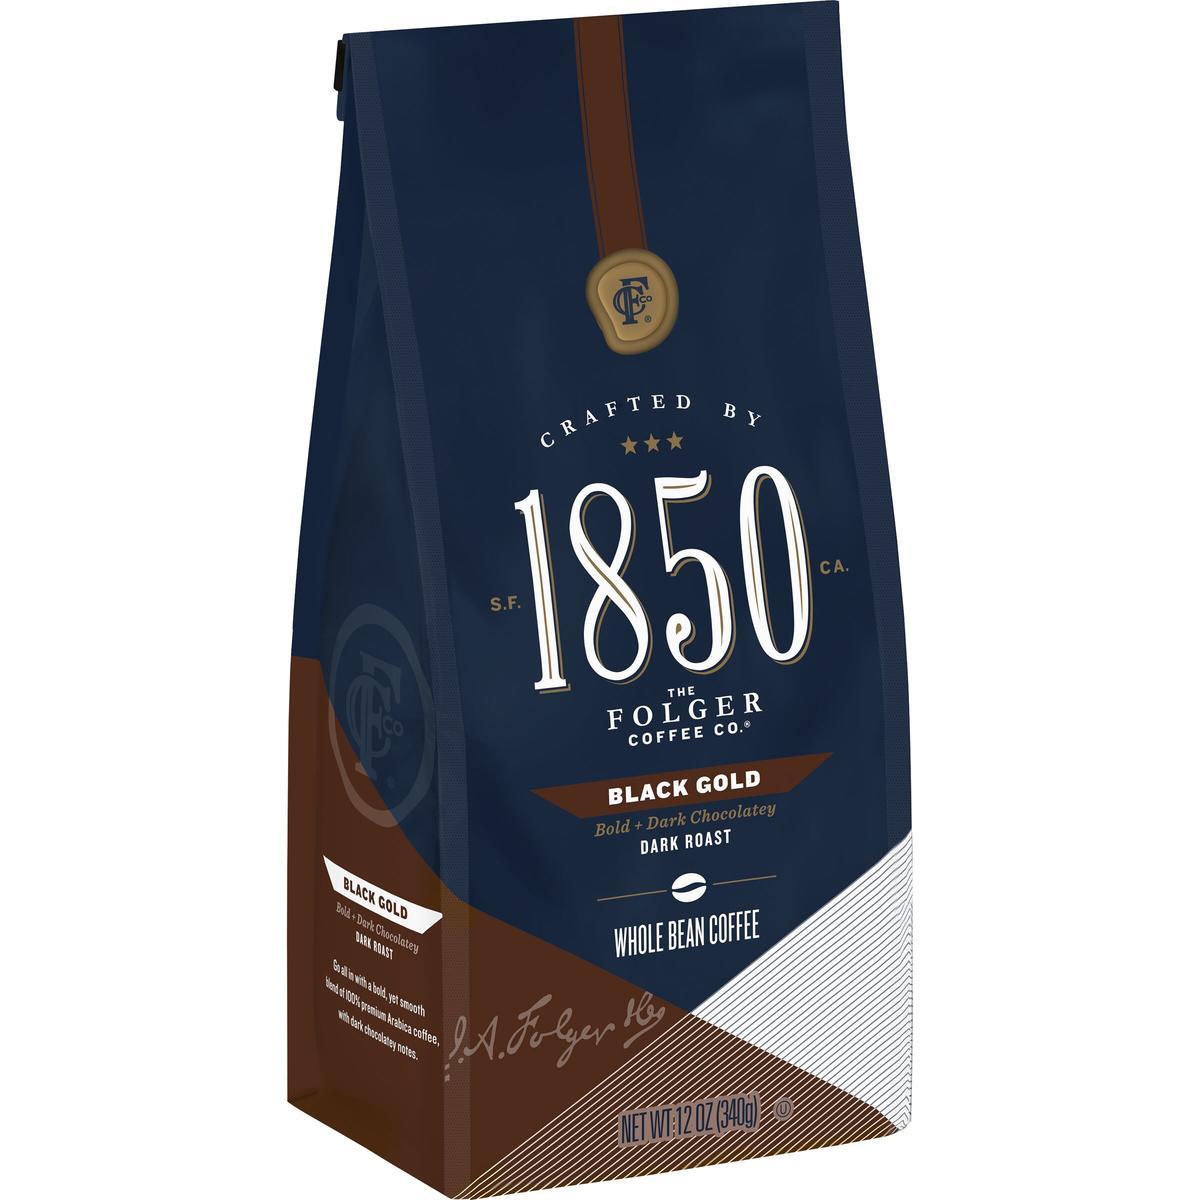 Folgers 1850 dark roast coffee, whole bean coffee, black gold variety, 12oz bag